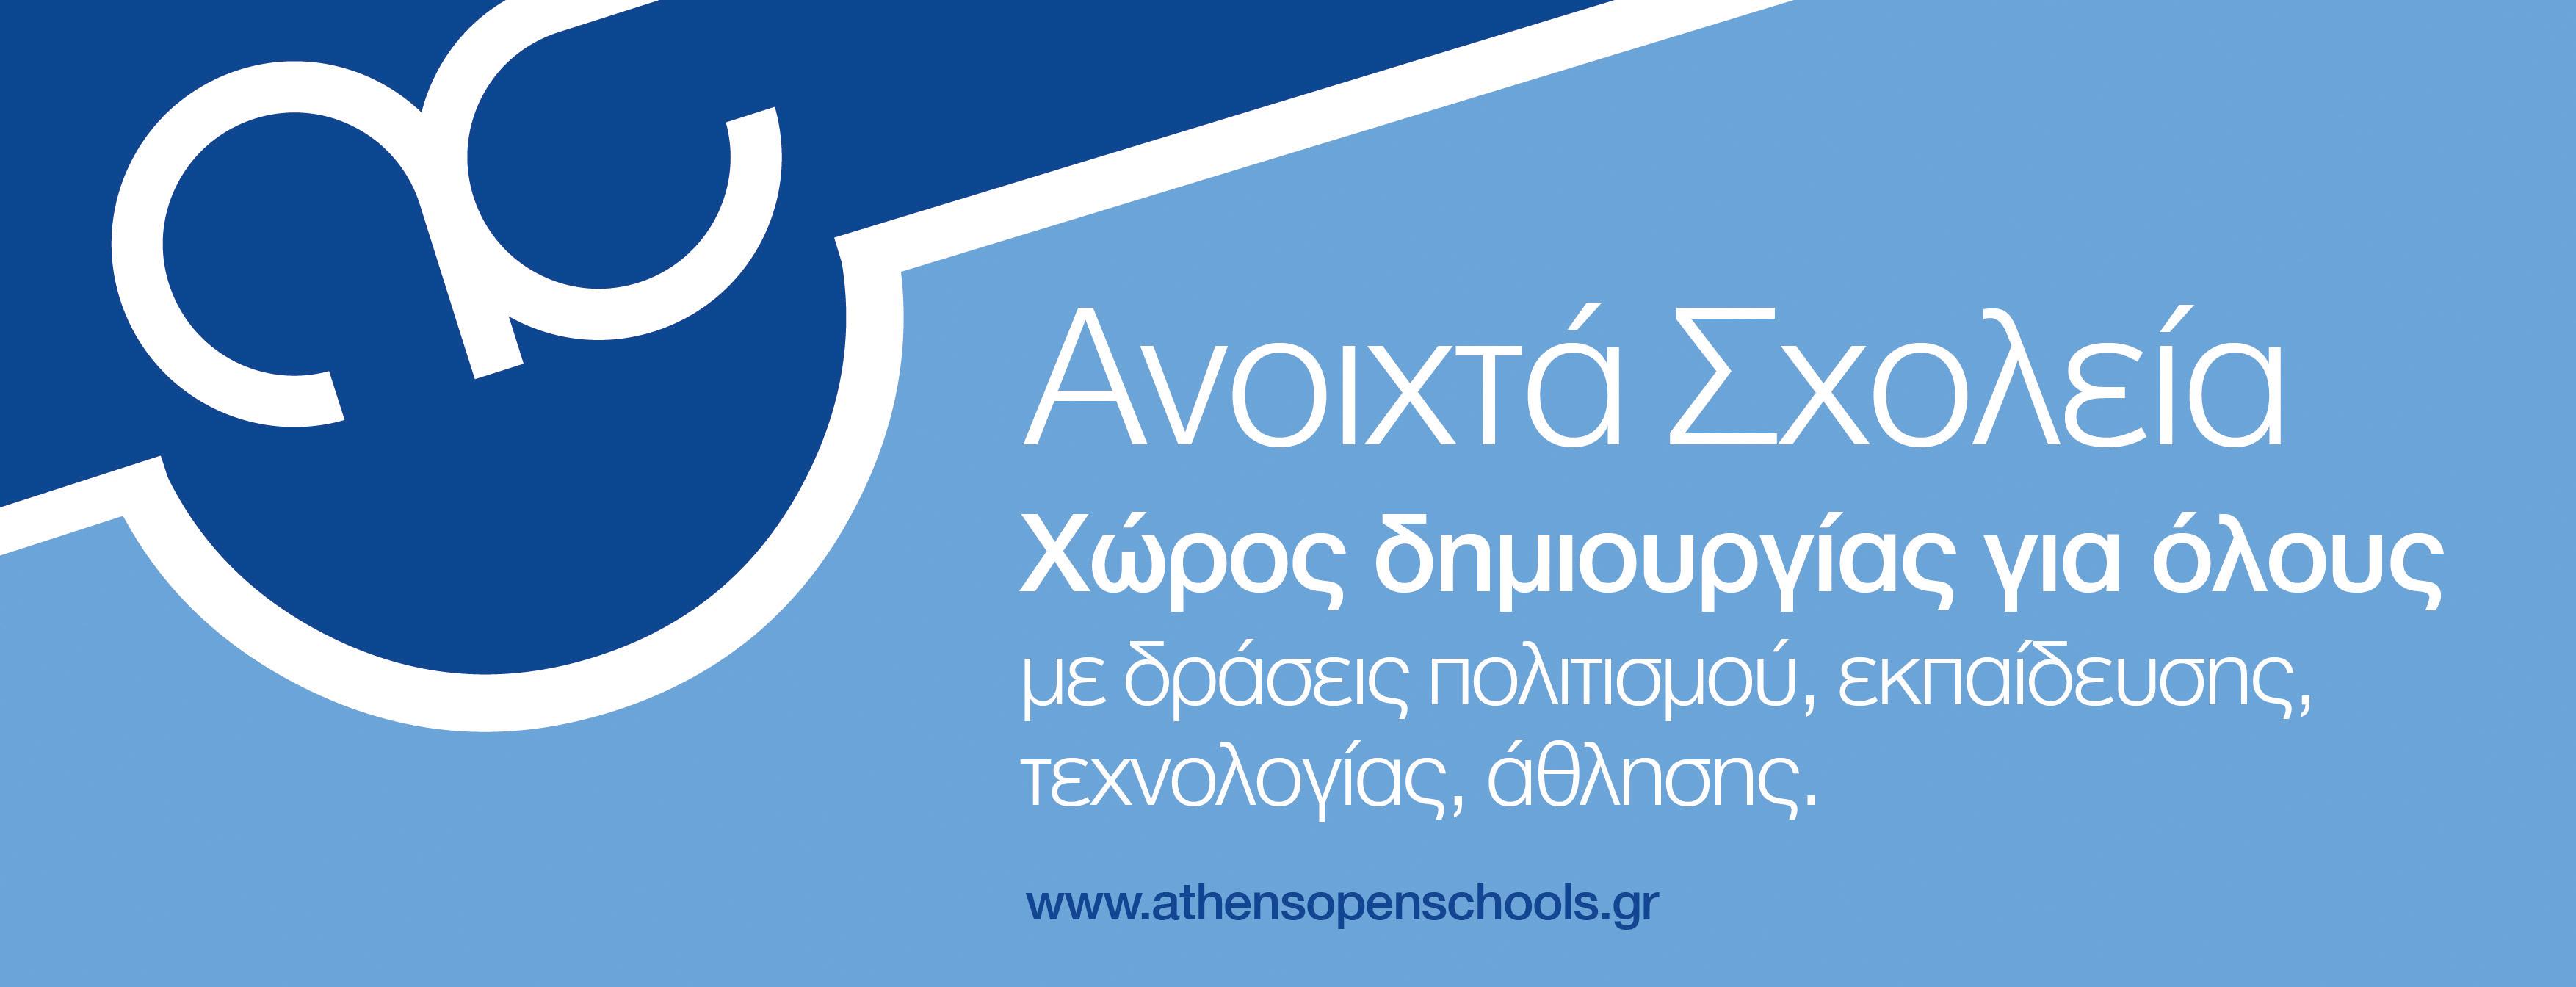 Athens-Open-Schools-POSTER-A3-Header